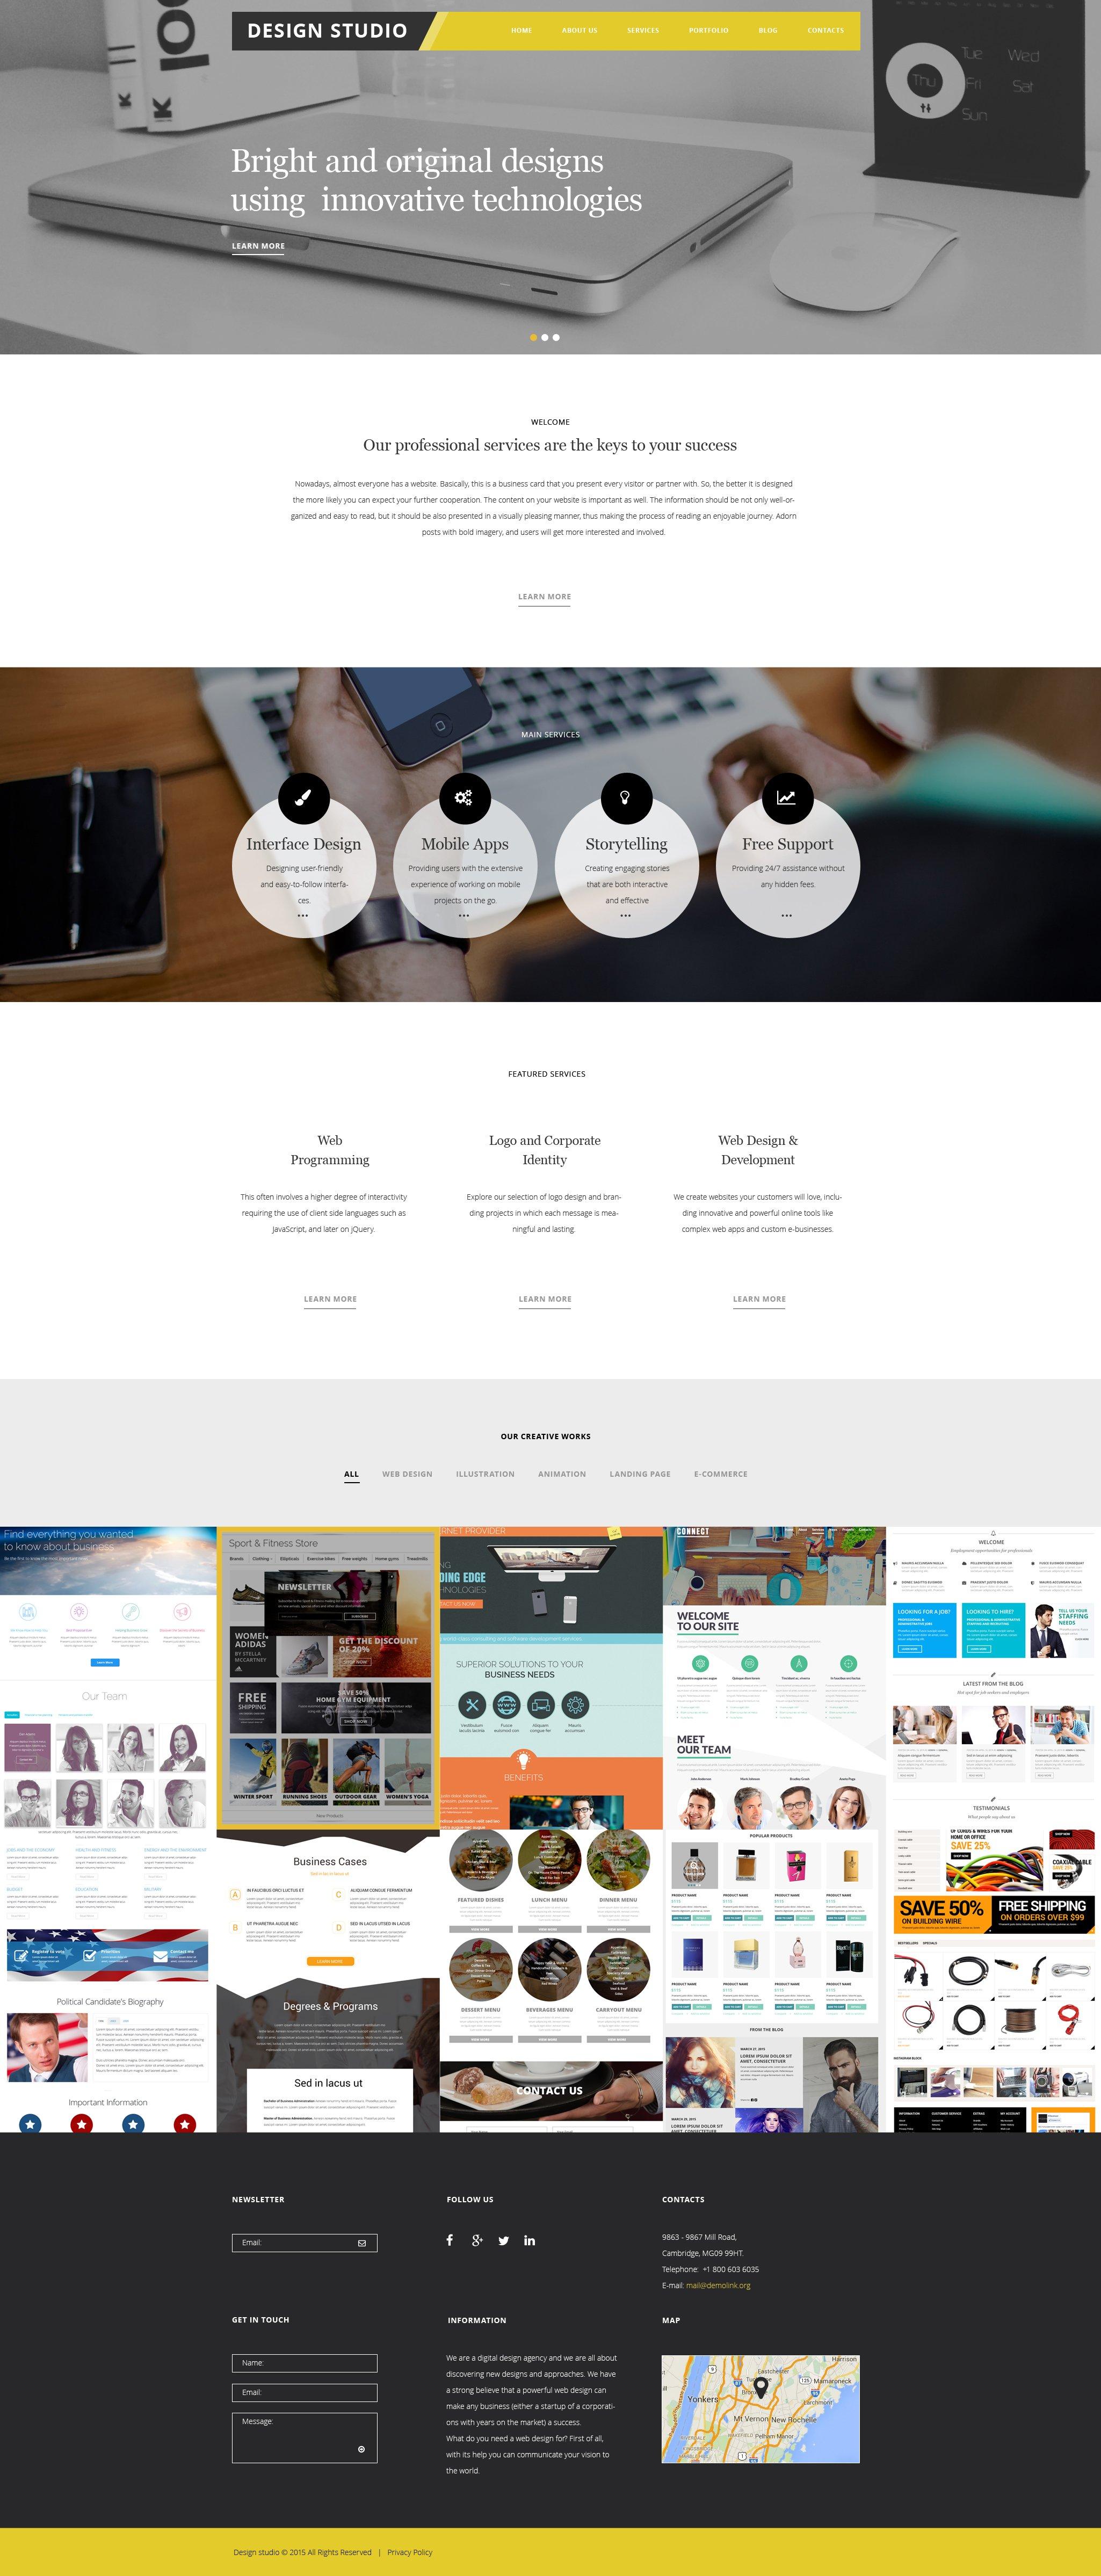 Design Studio №56038 - скриншот